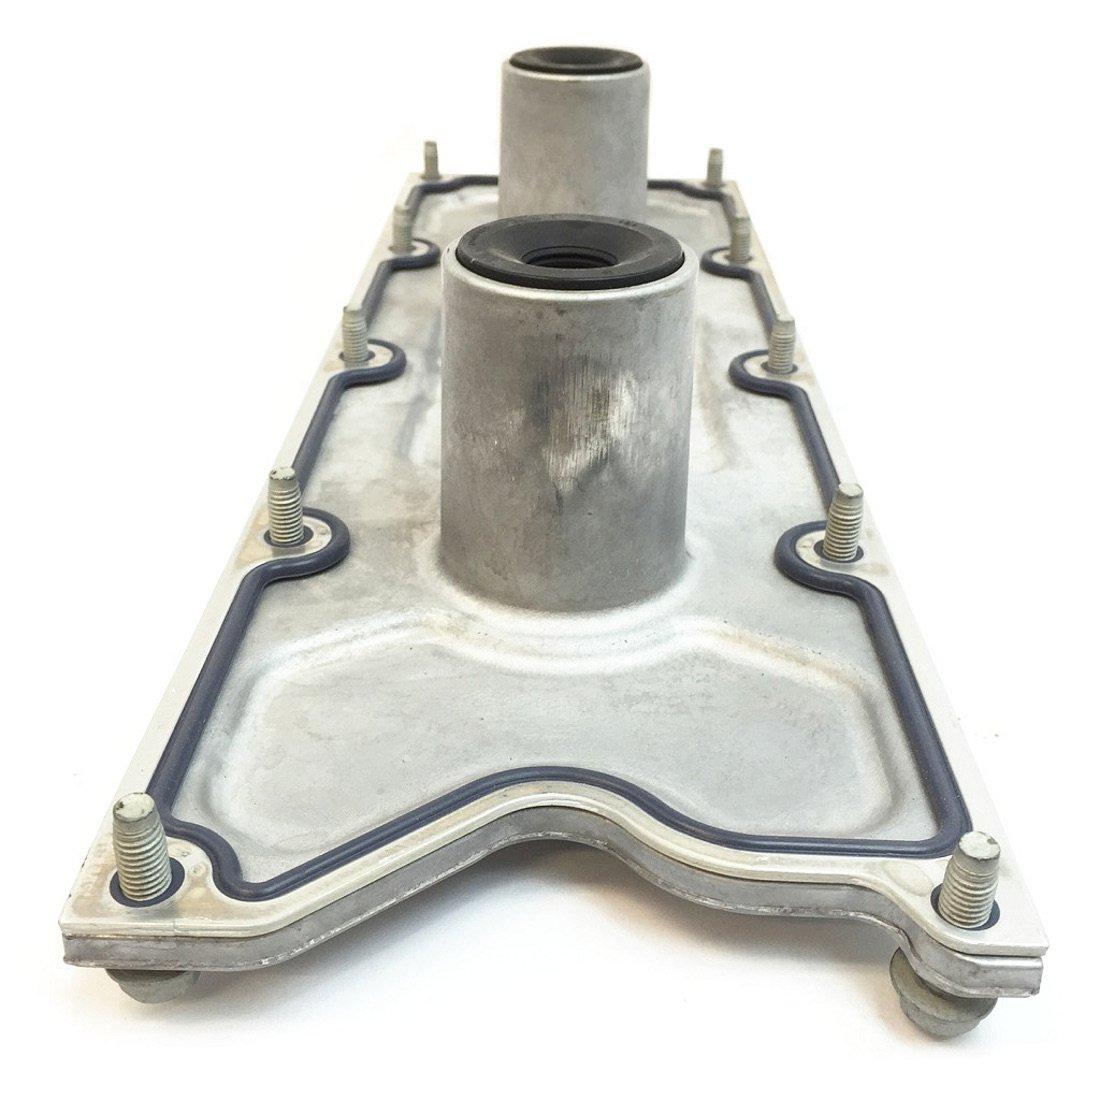 New Gm Oem Engine Valley Cover 12561107 Gen Iii Lm7 Lq4 Ls Cooling Diagram Lq9 48l 53l 60l Automotive